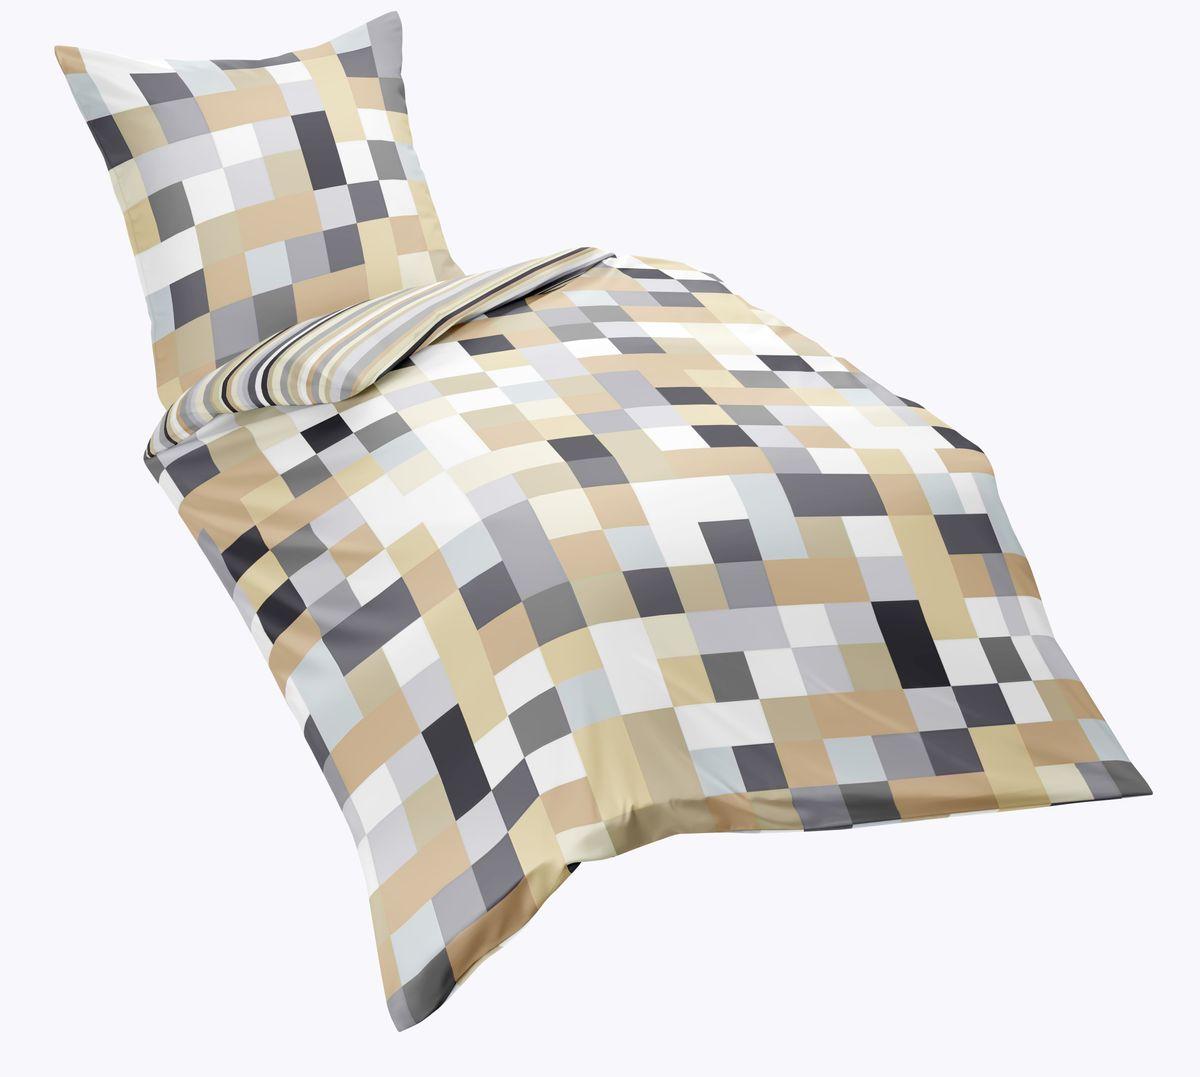 fleuresse renforce bettw sche 3 tlg karos okker sand braun wei 143323 7 bettw sche bettw sche. Black Bedroom Furniture Sets. Home Design Ideas